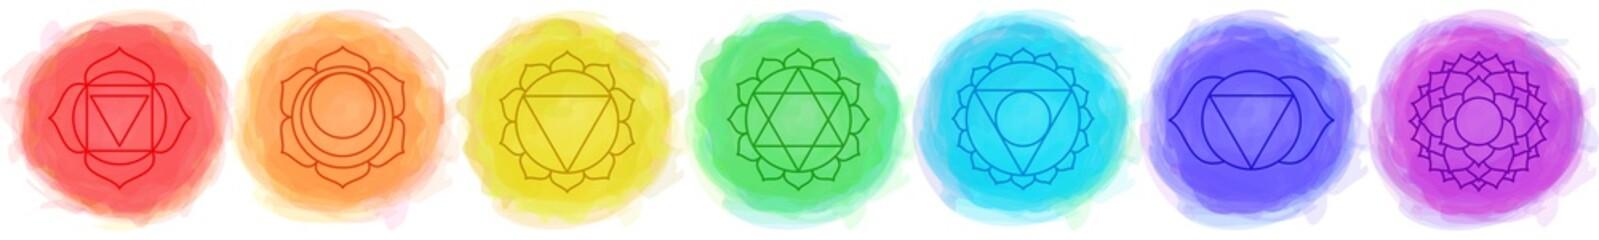 Chakras set: muladhara, swadhisthana, manipura, anahata, vishuddha, ajna, sahasrara. Vector line symbol. Om sign. Smoky circles. Watercolor style. Sacral icon. Meditation